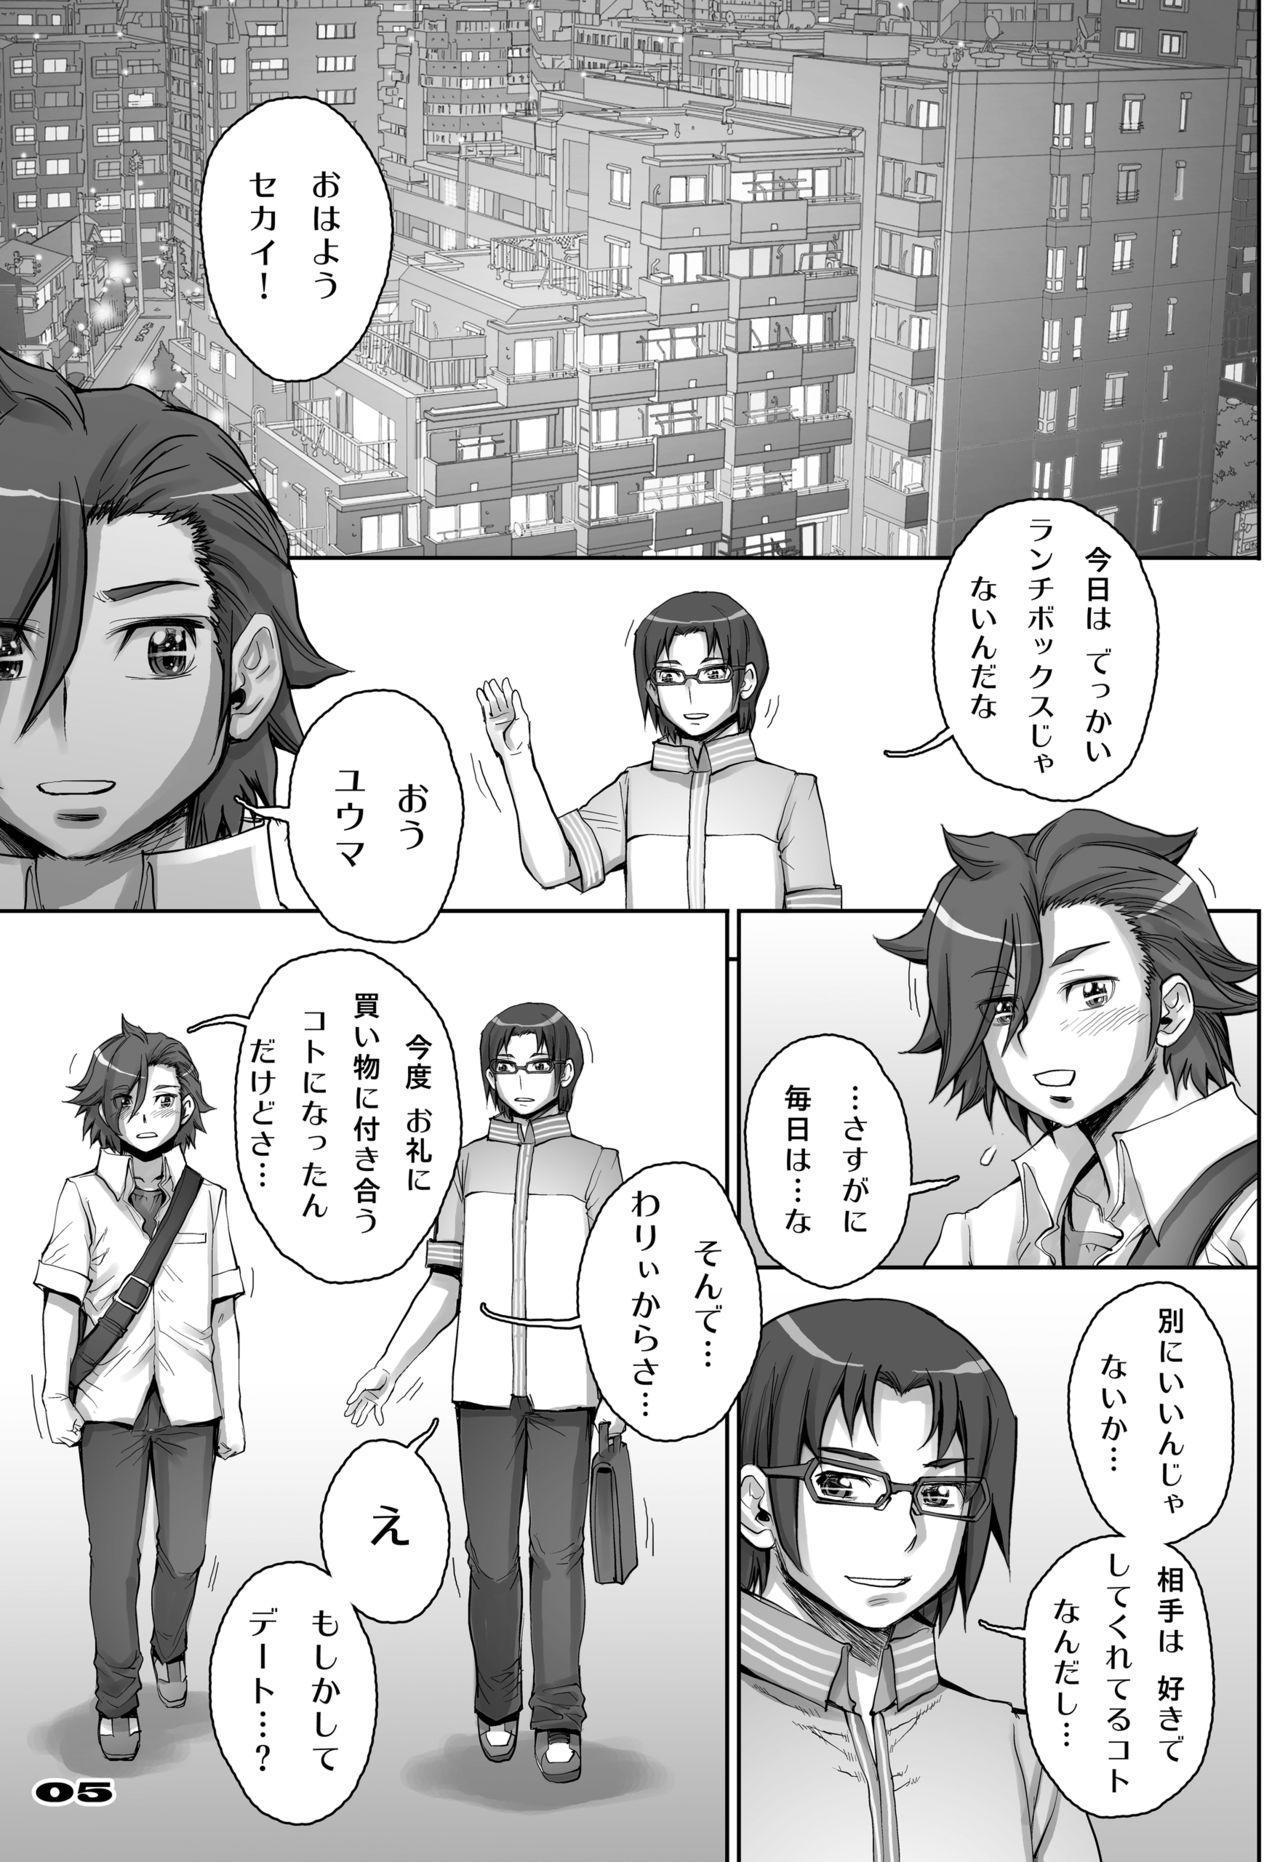 [Studio Tapa Tapa (Sengoku-kun)] Daddy-Long-Legs #2 (Gundam Build Fighters Try) [Digital] 4